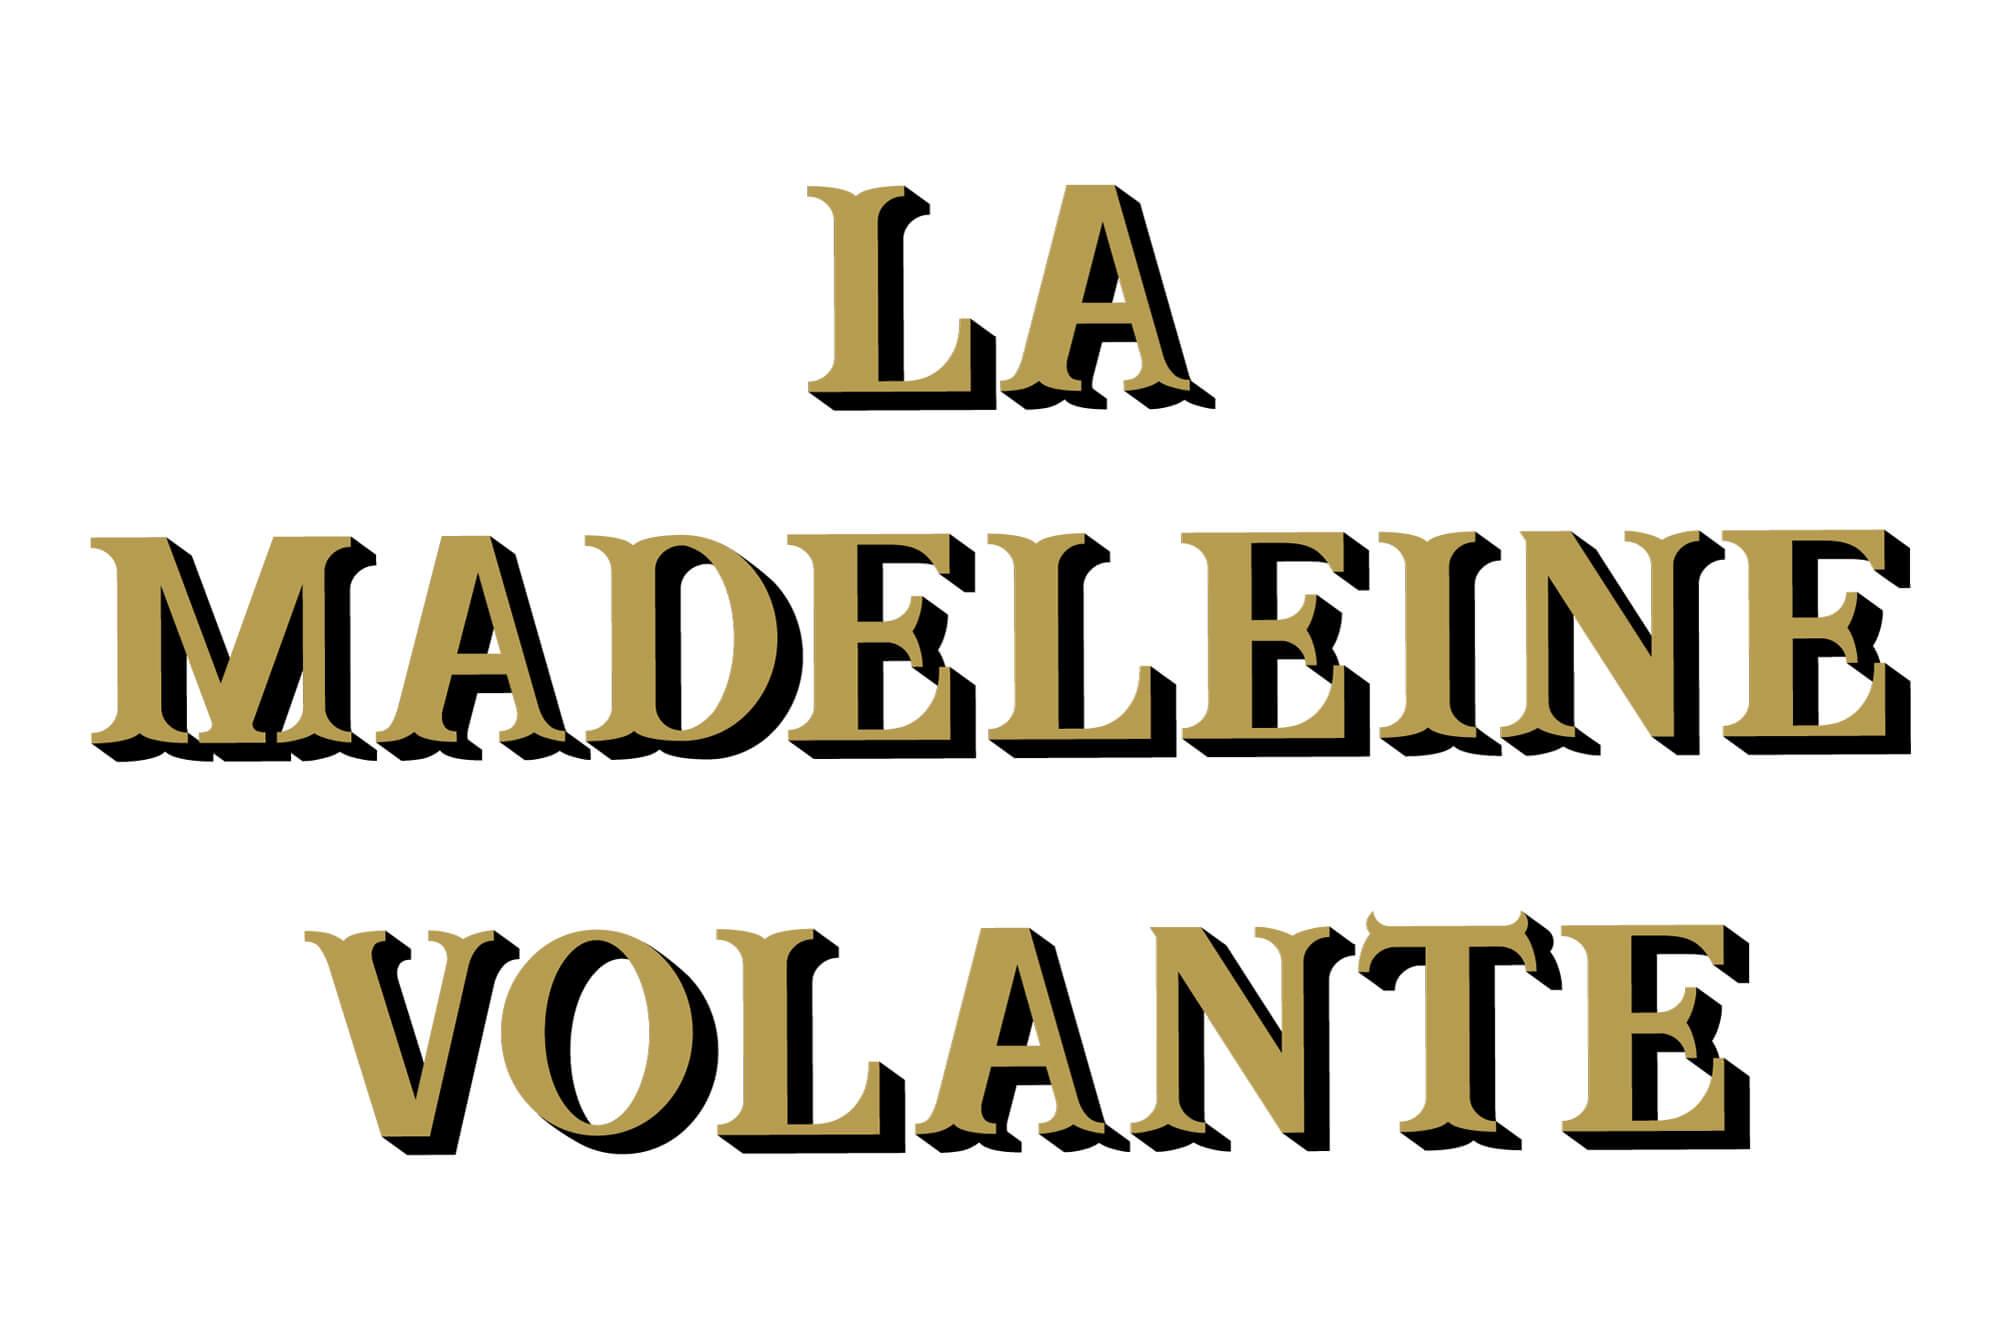 Le logo de la start up La madeleine volante, typographie vintage et dorure, design IchetKar